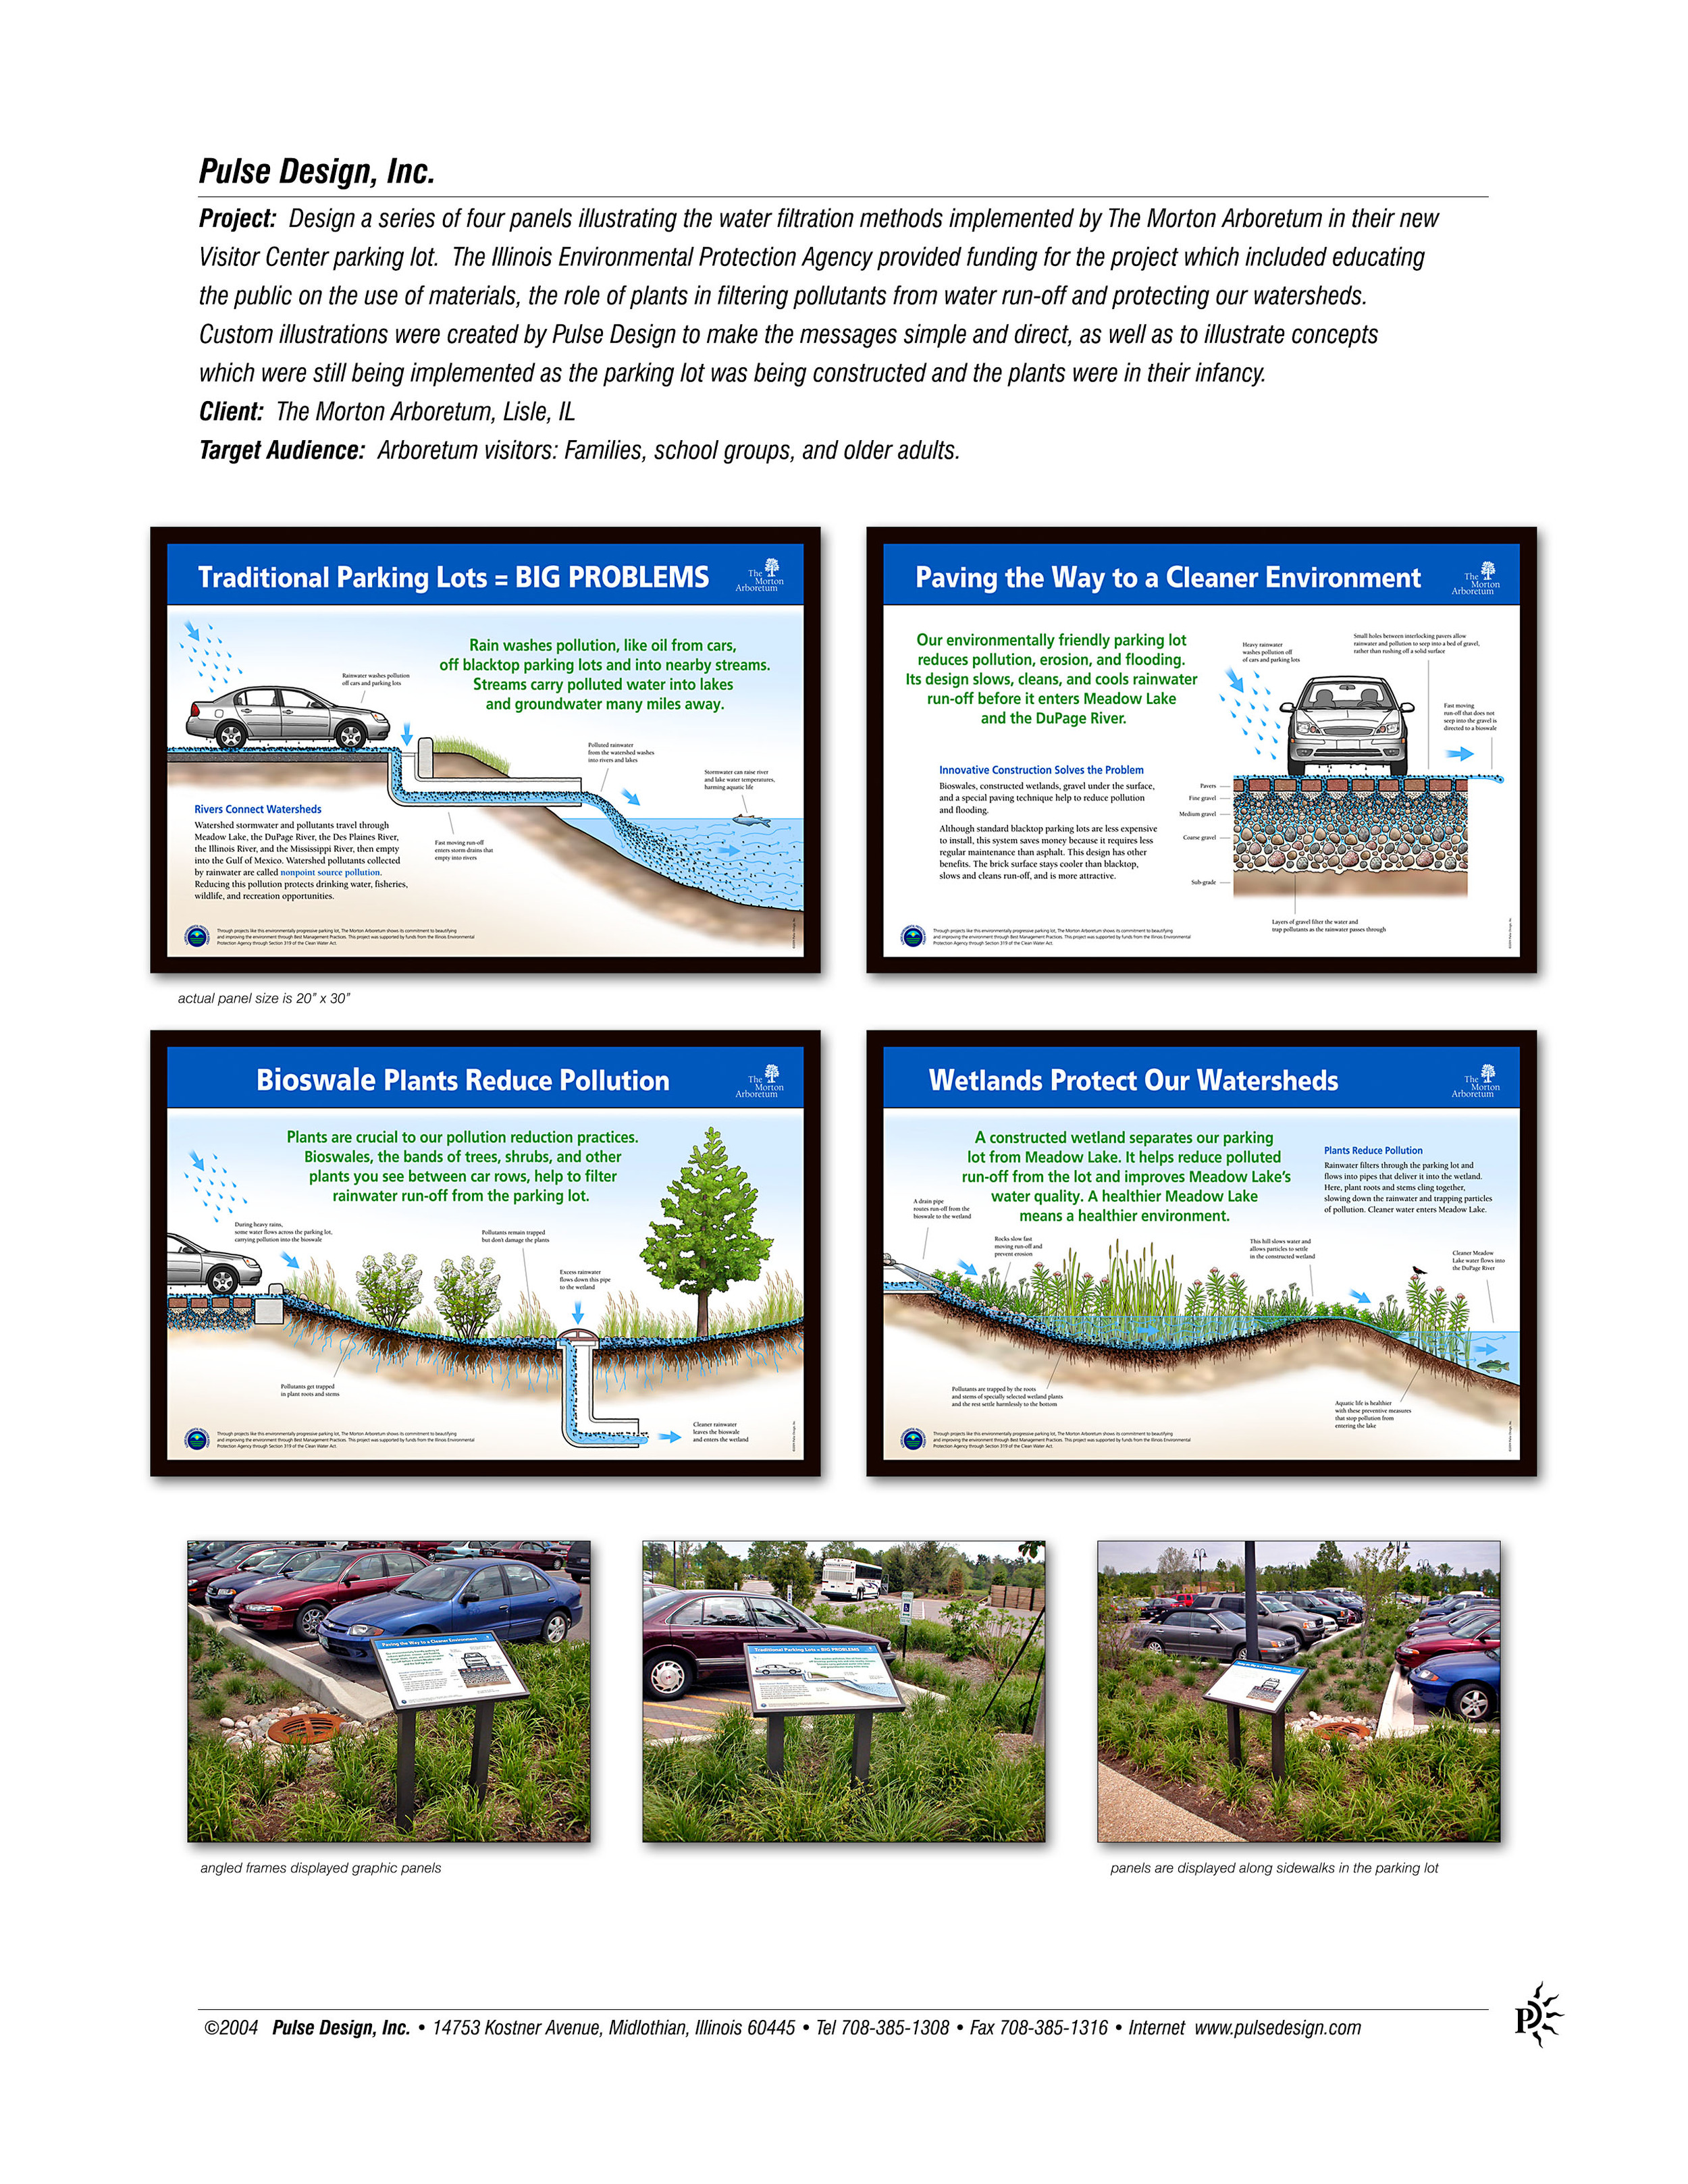 Morton-Arboretum-Bioswale-Signs-Pulse-Design-Inc.jpg